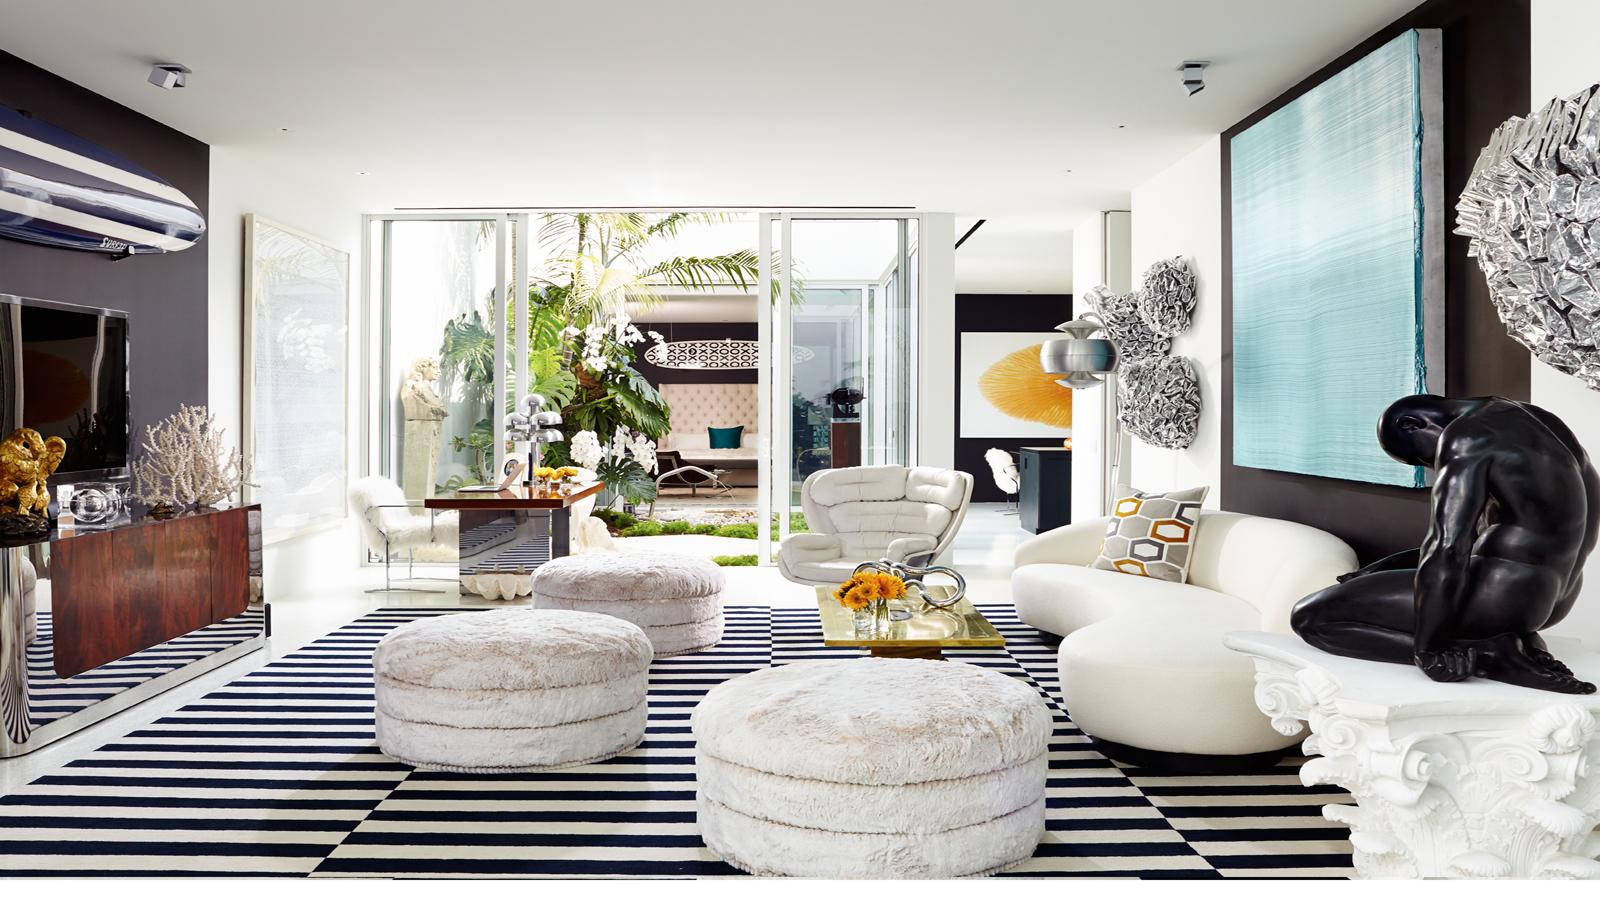 Five Great Miami Interior Designers To Look Out For The Big Bubble Miami